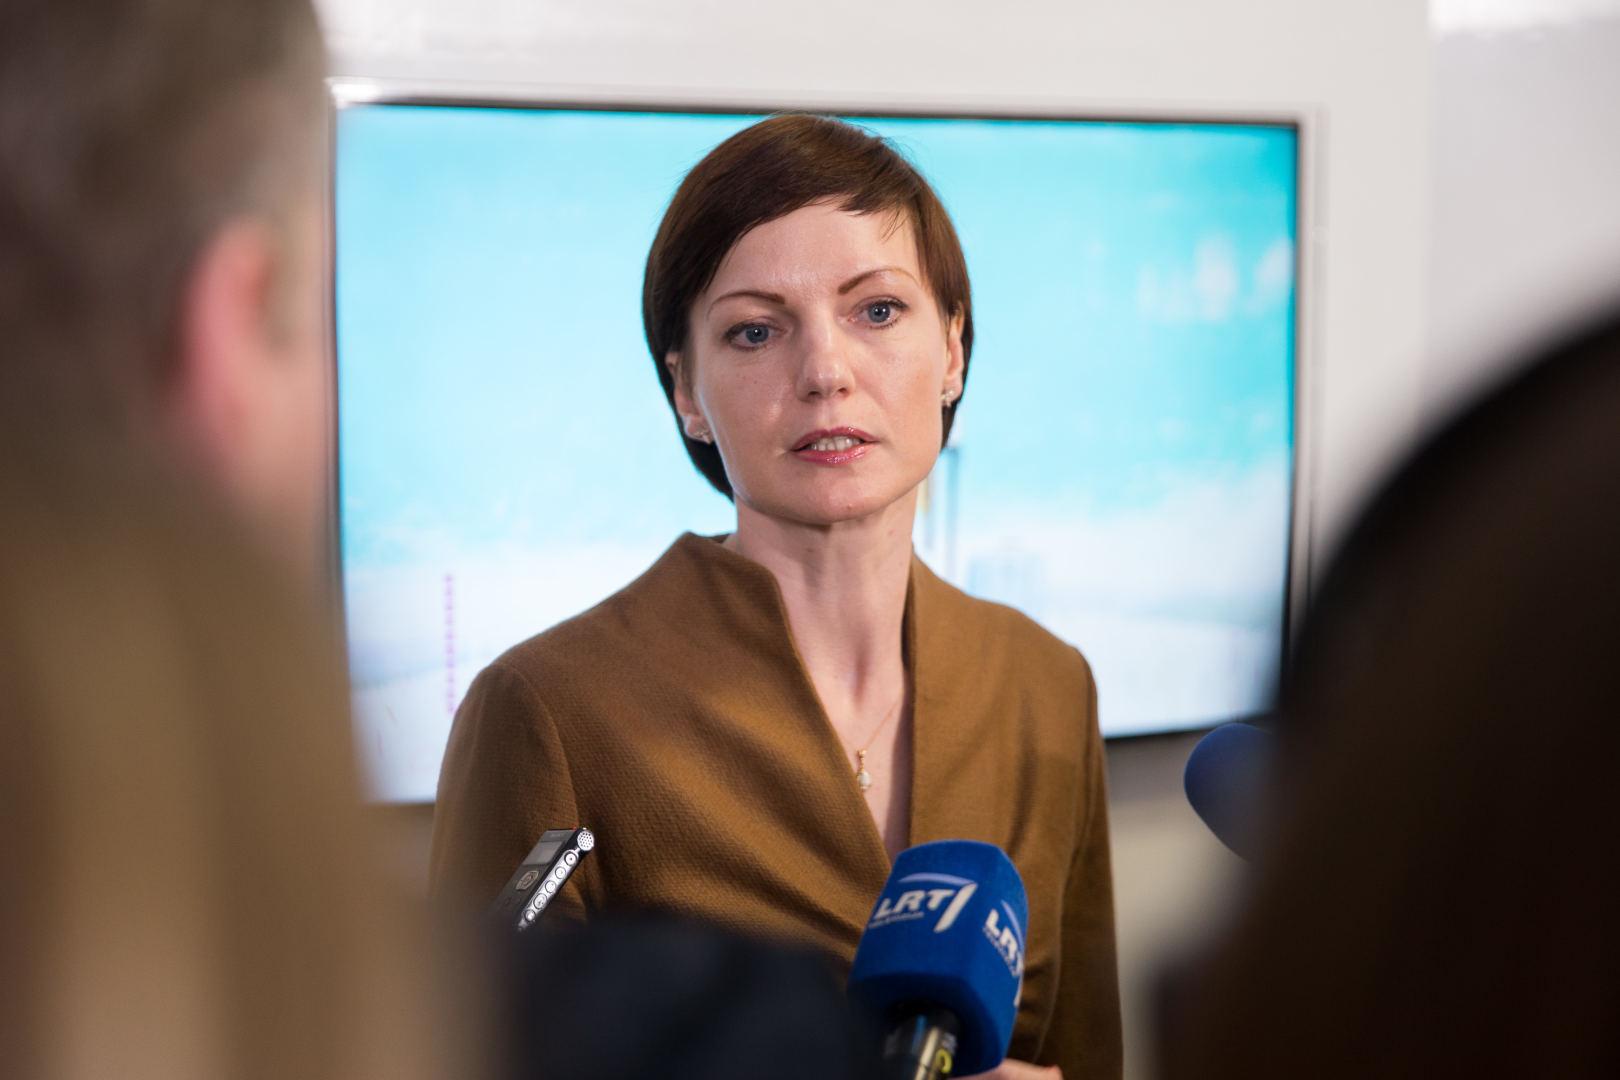 Pictures Marketa Galuszkova nude photos 2019